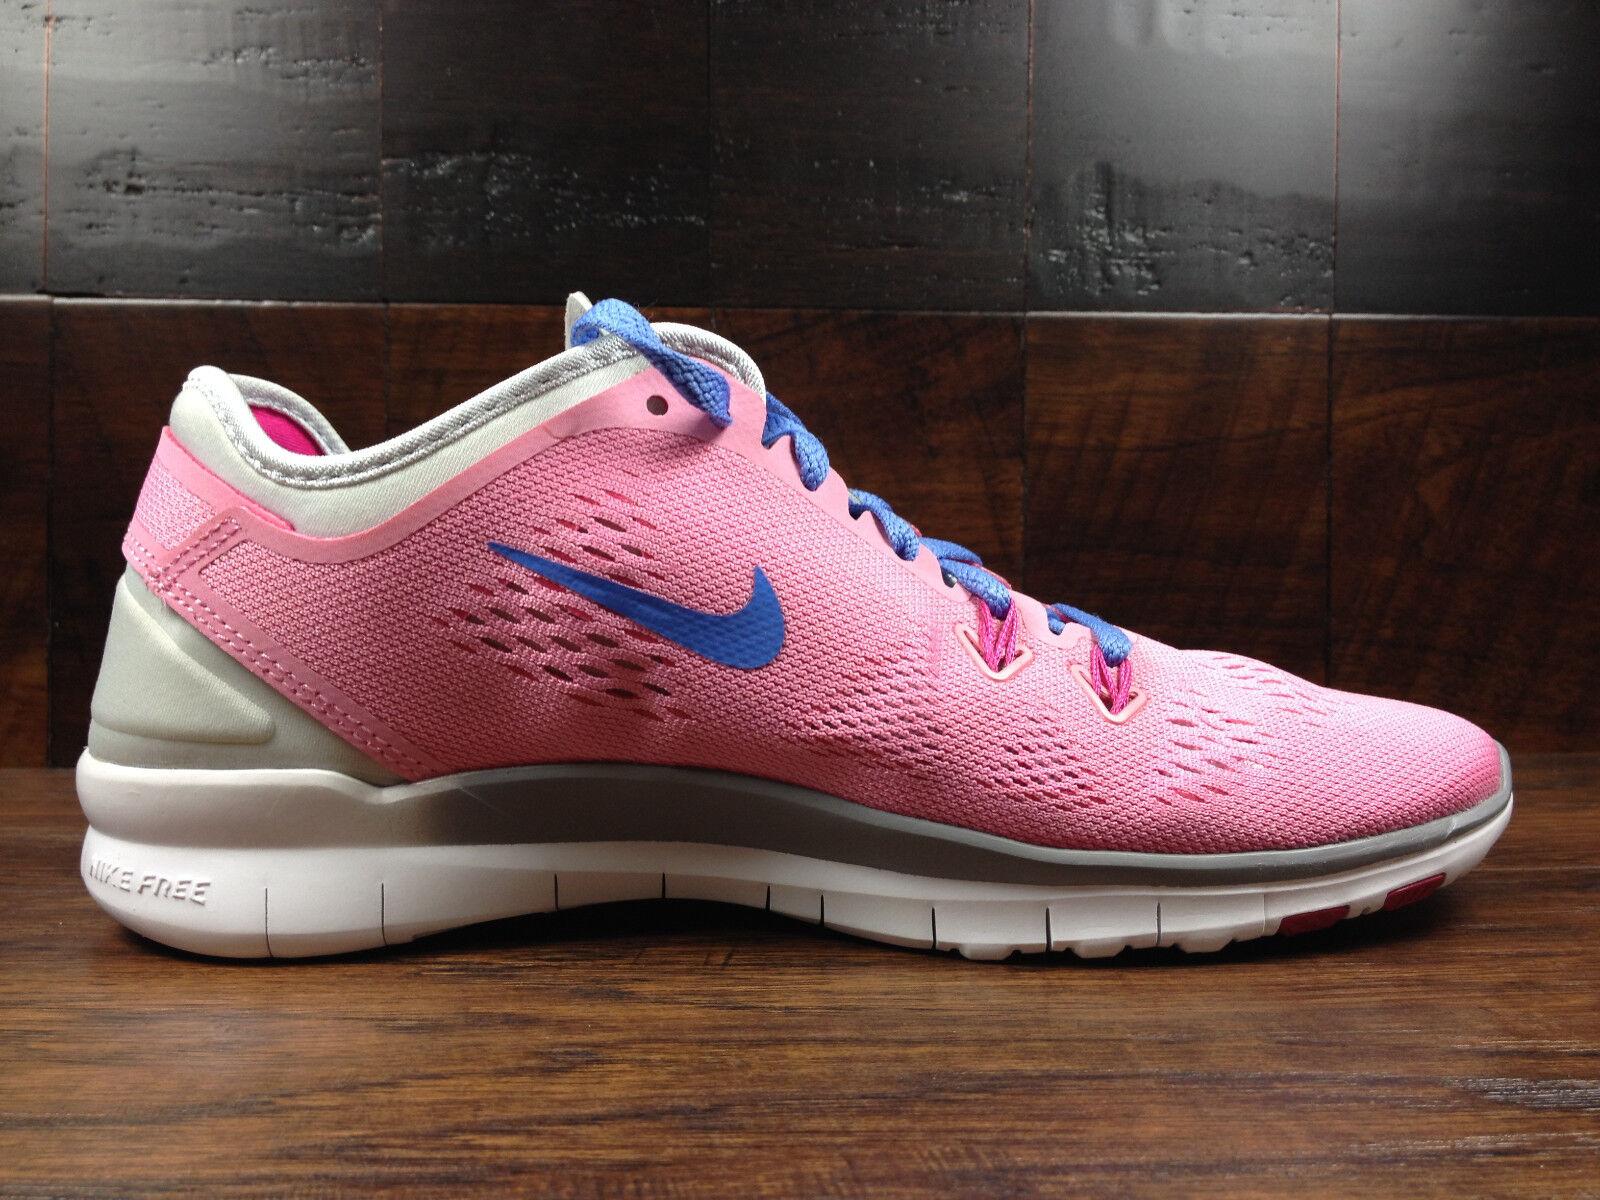 Nike free 5.0 / tr fit 5 frauen (rose / 5.0 polar / pure platinum) crossfit 1d8d25